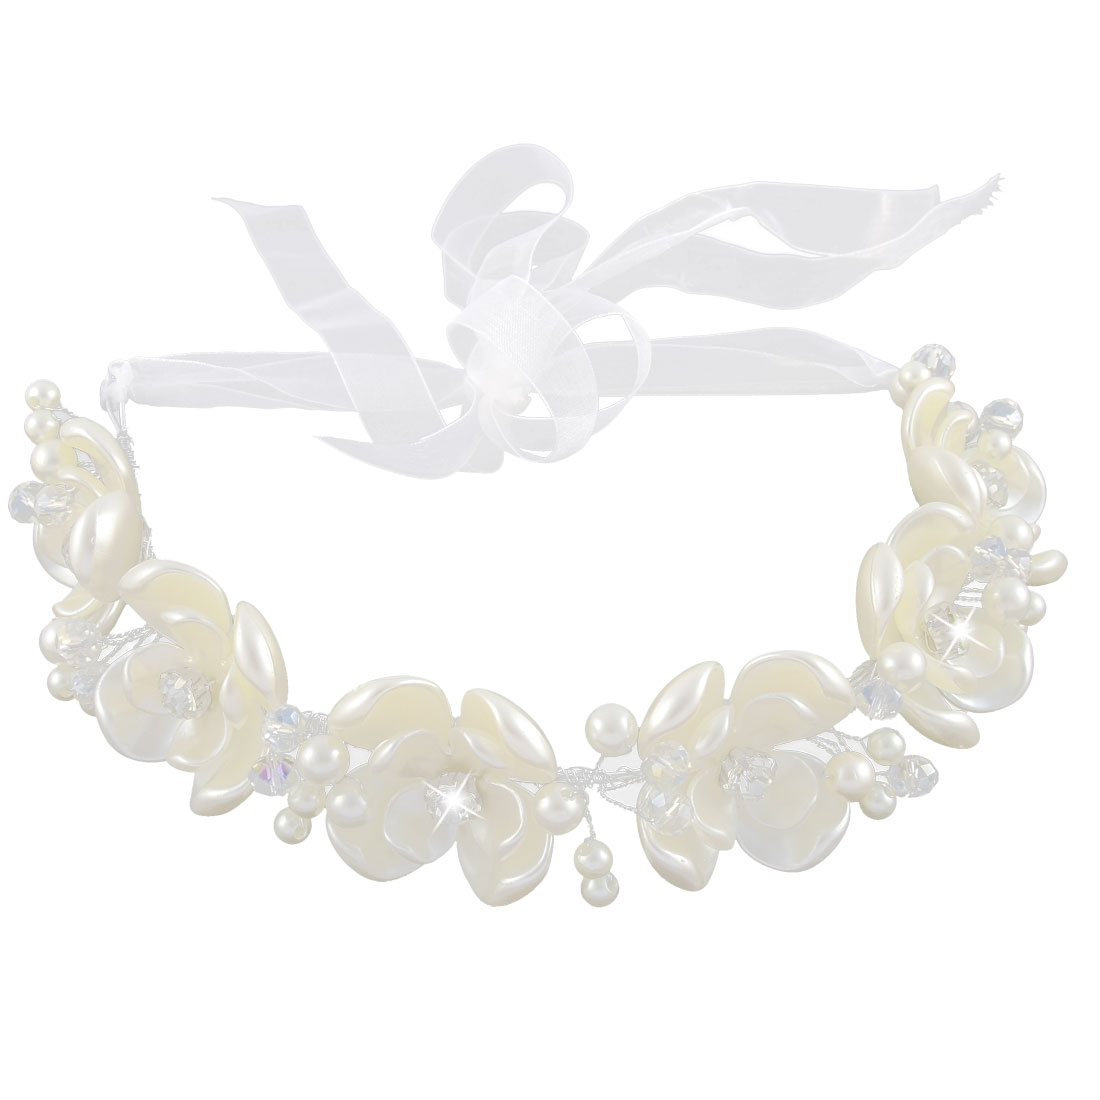 Metal Wire Plastic Flower Rhinestone Inlaid Ribbon Detail Hairband Head Band Headpiece